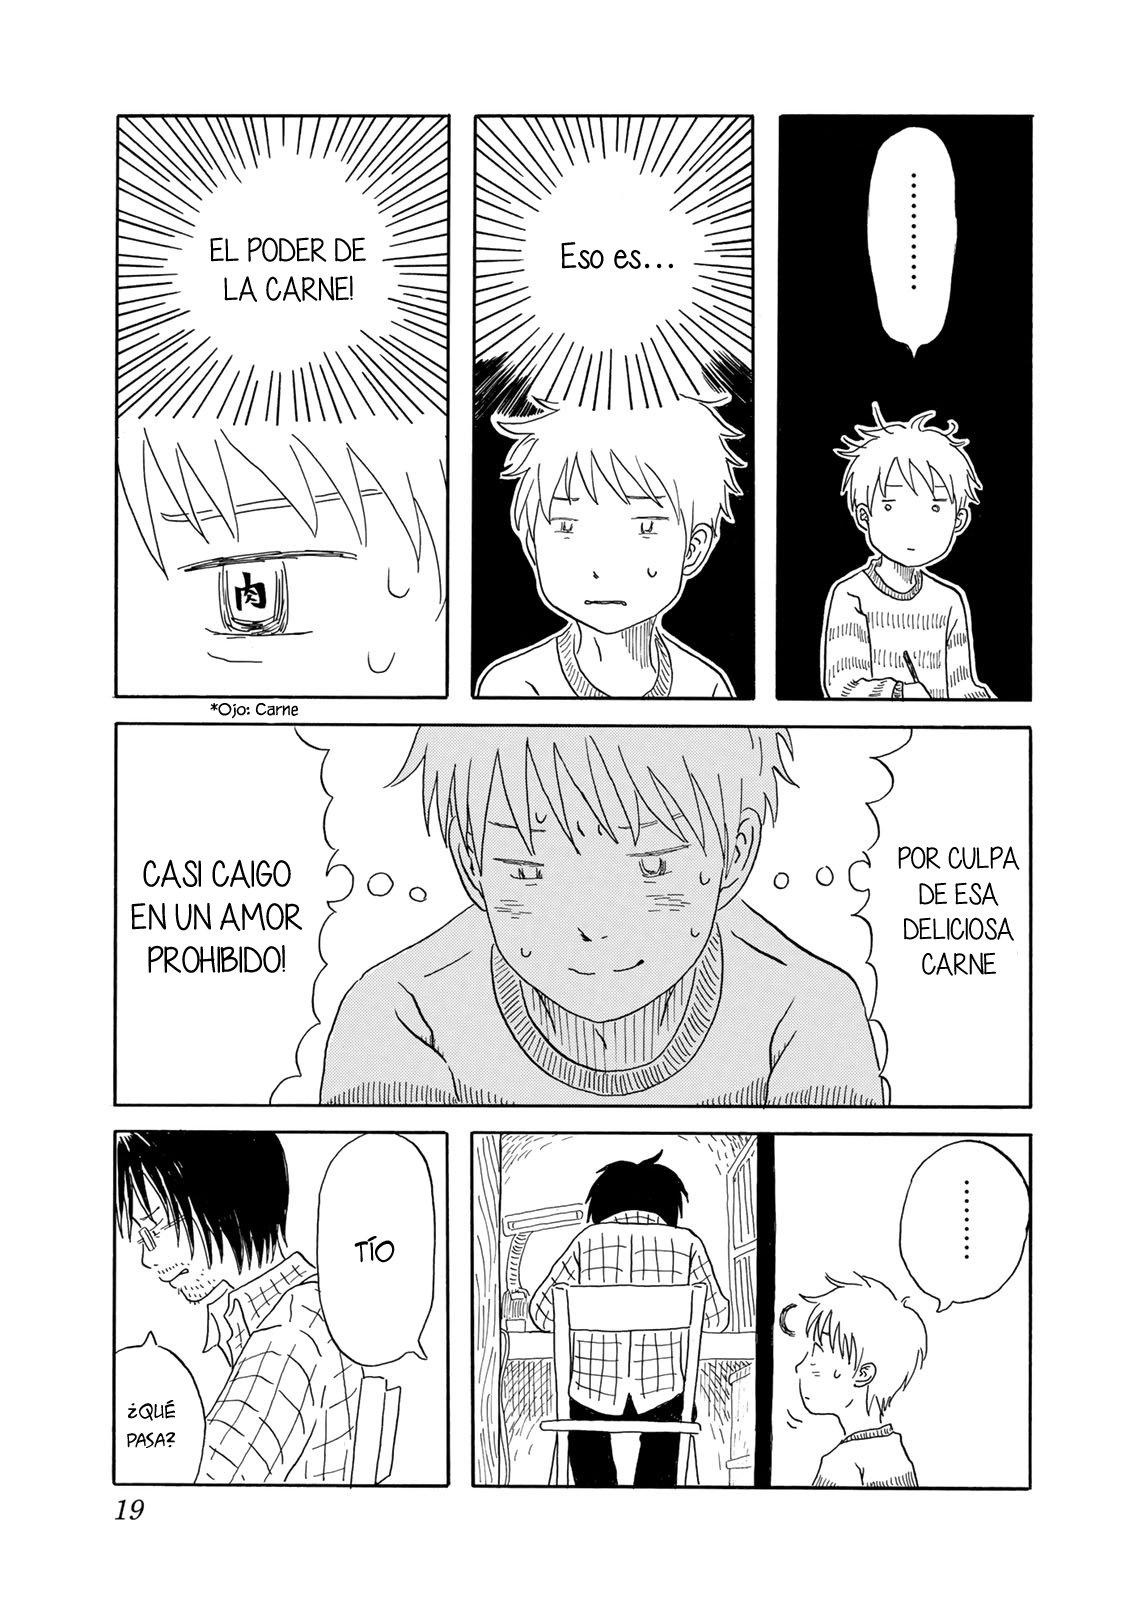 https://nine.mangadogs.com/es_manga/pic8/50/36658/946317/d6172d2d110646a4384c44faea26b6eb.jpg Page 23